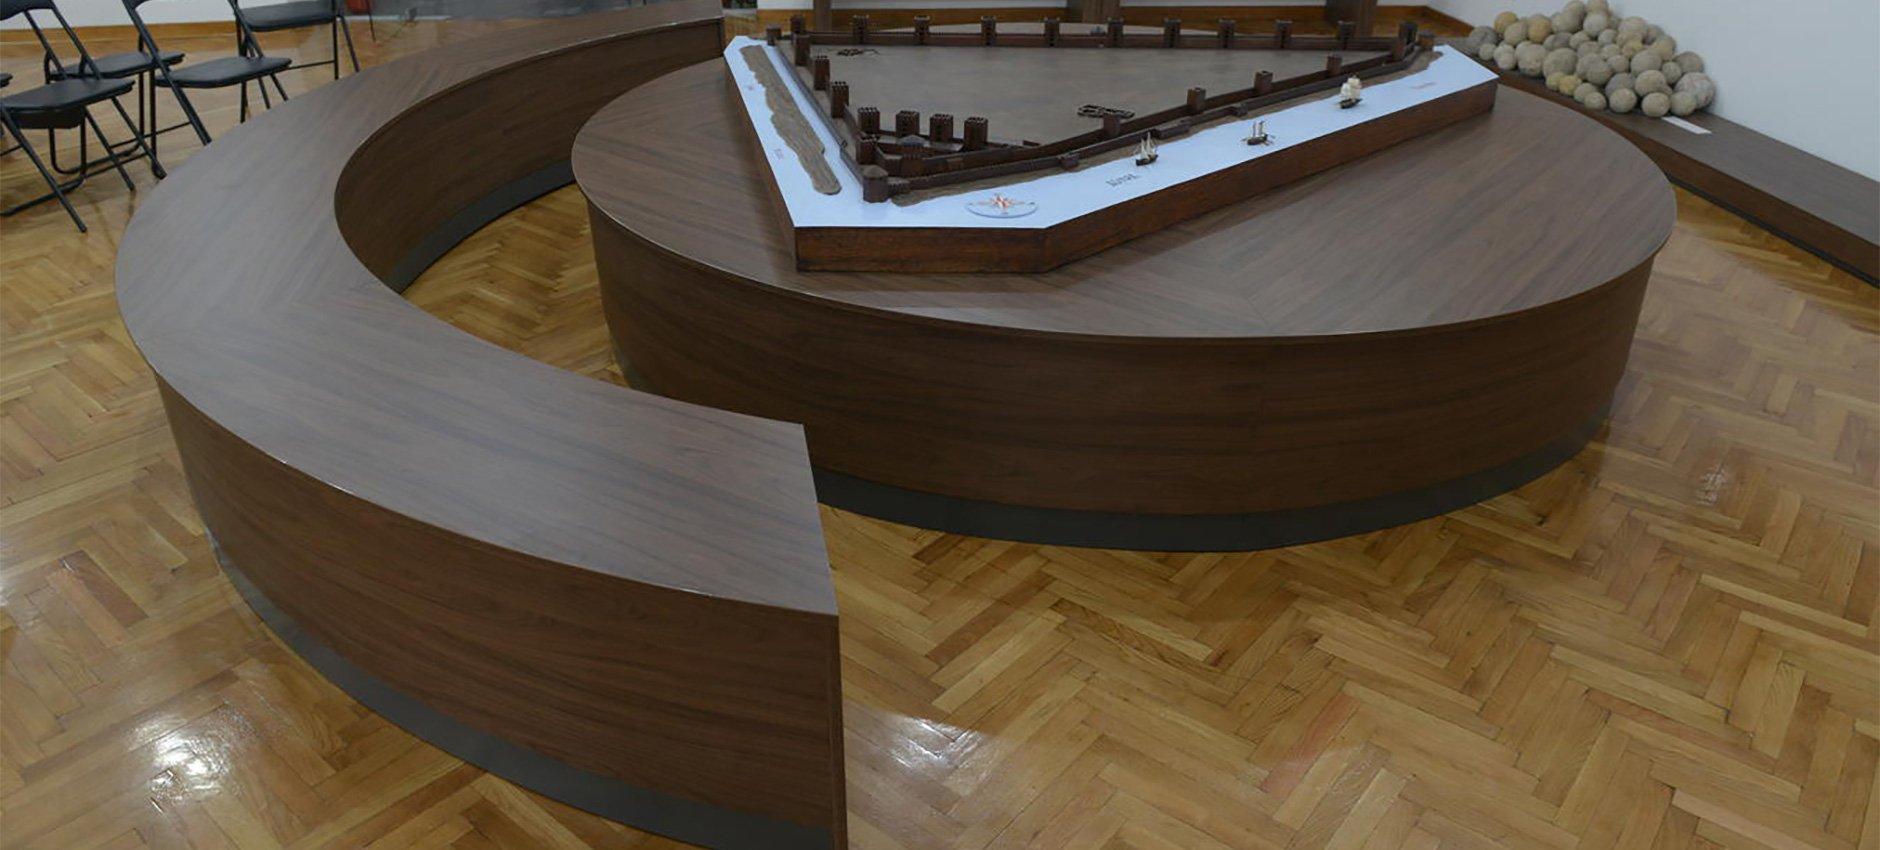 smederevo-muzej-21.jpg